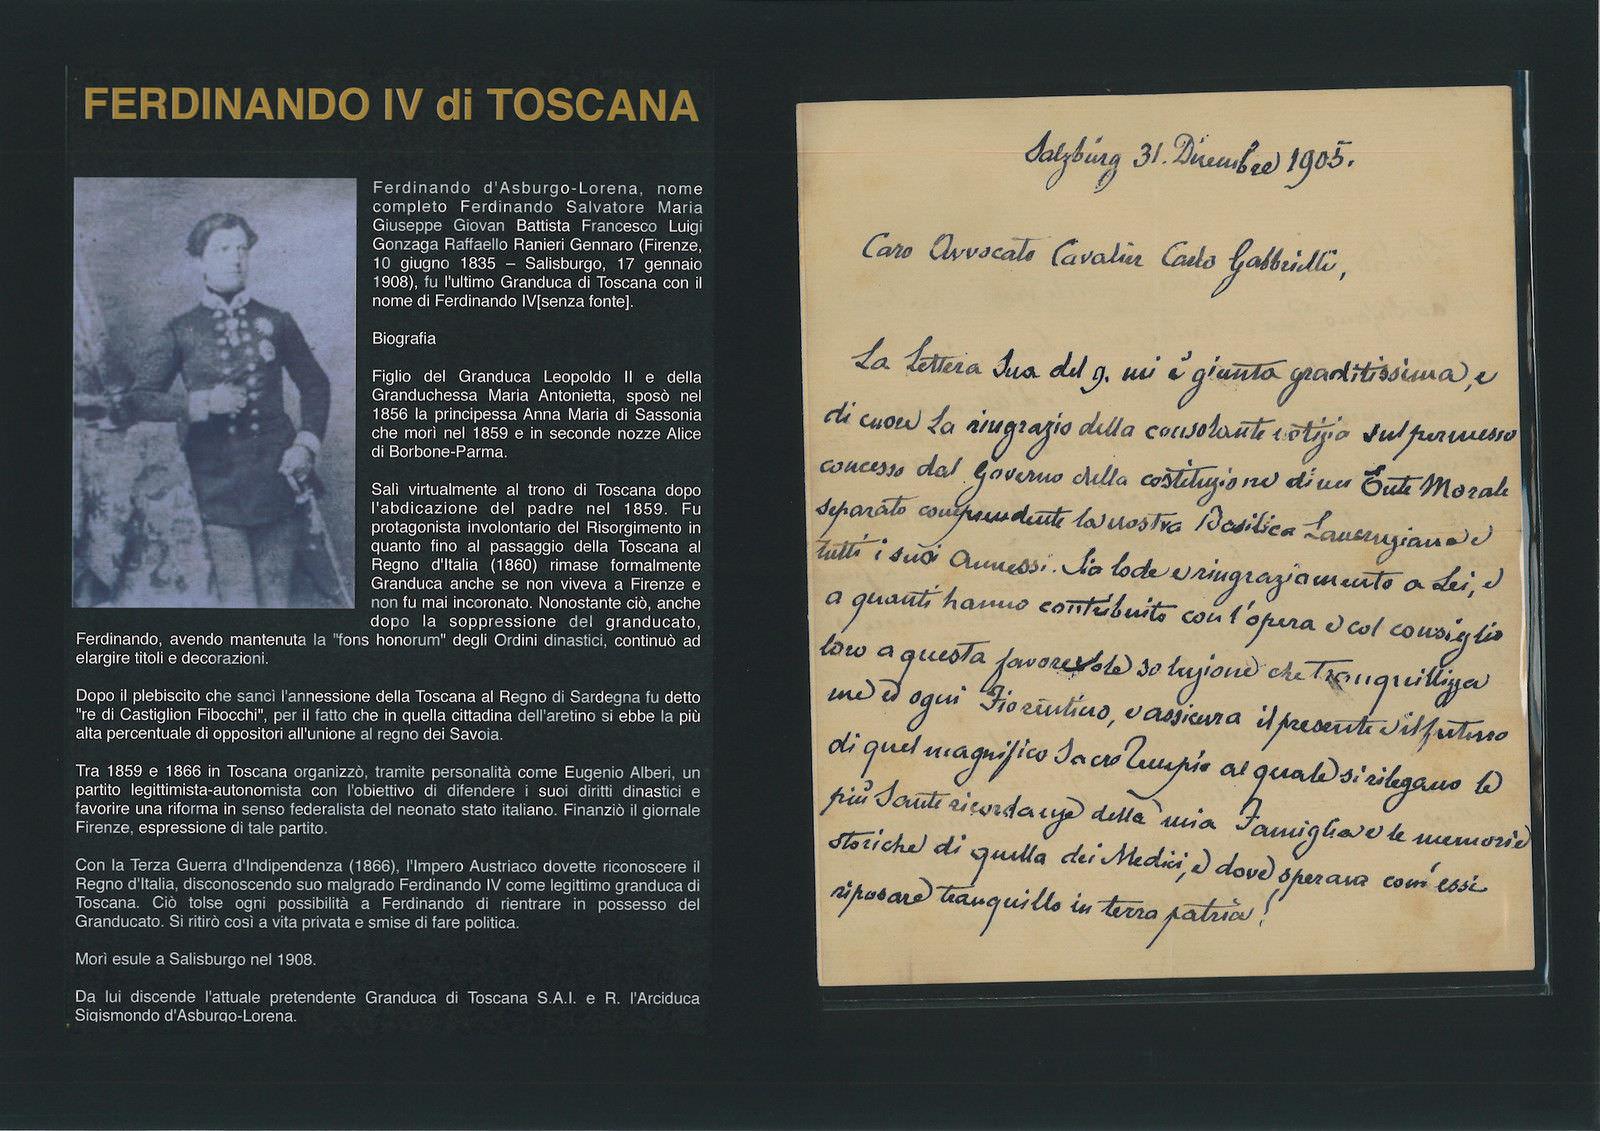 Ferdinando IV di Toscana